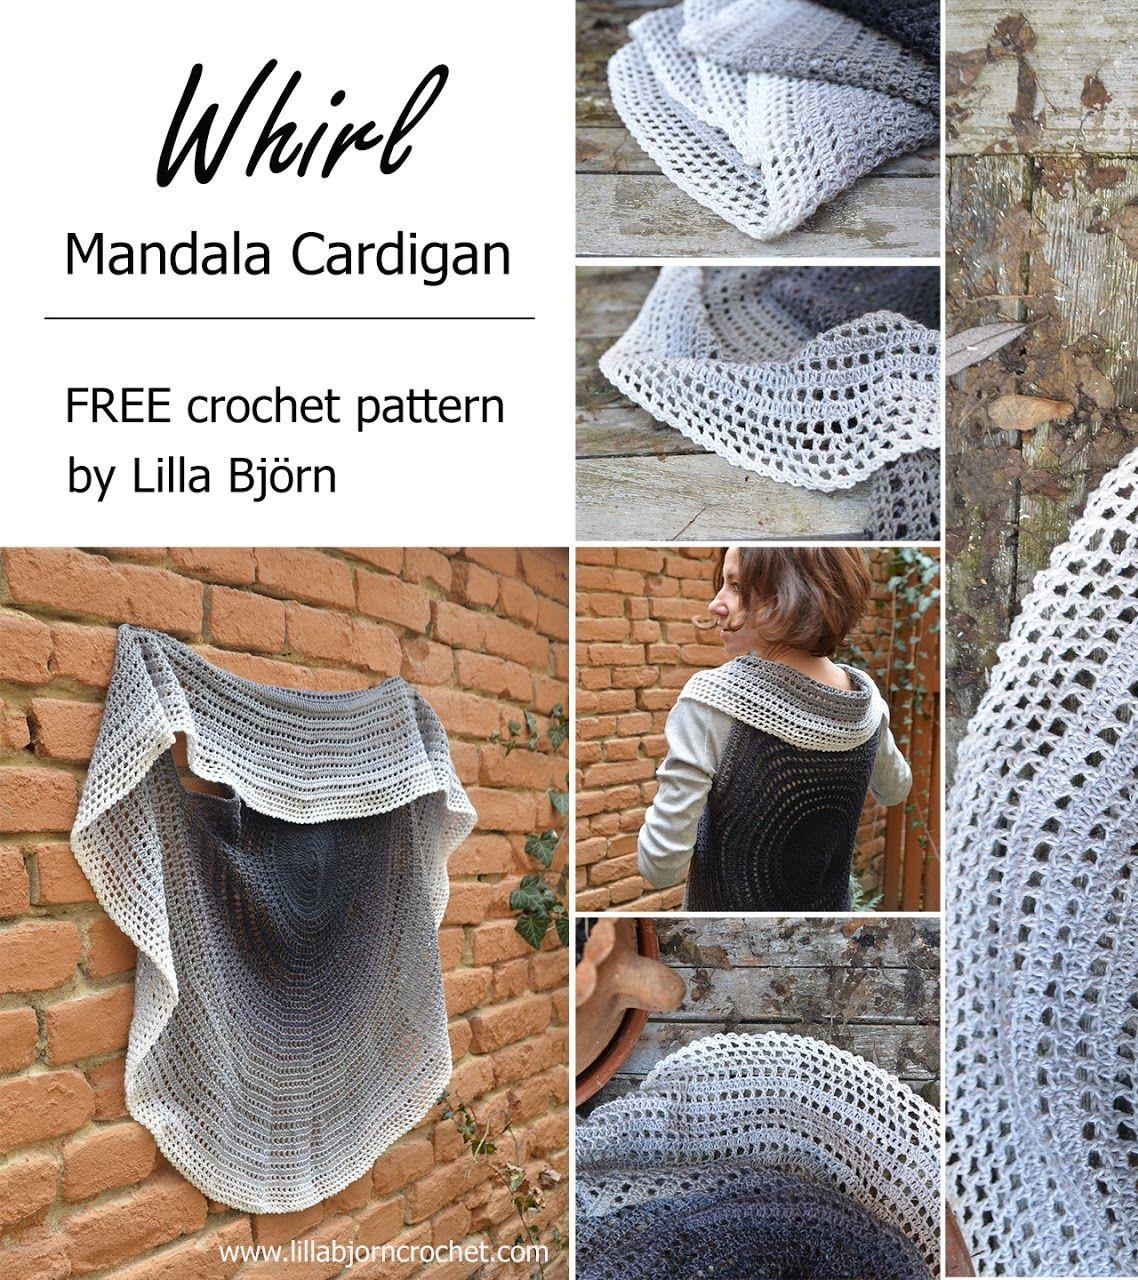 Whirl Mandala Cardigan - FREE crochet pattern (LillaBjörn\'s Crochet ...